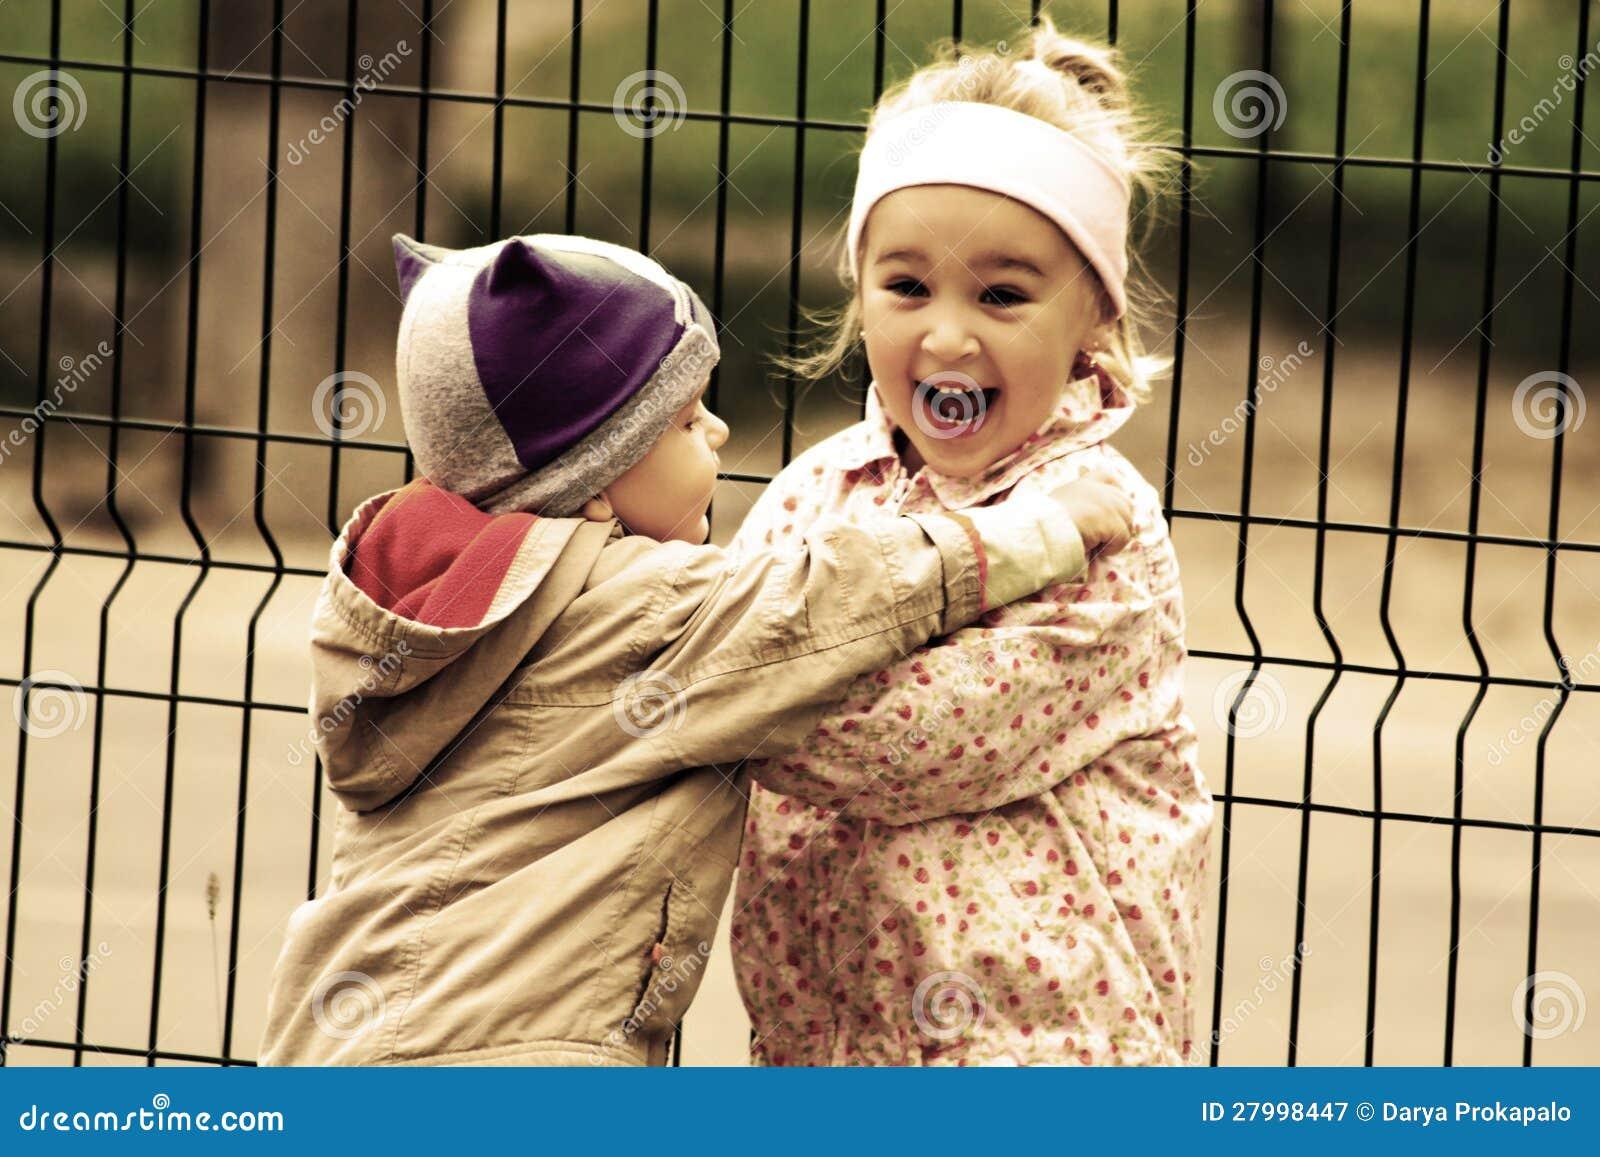 funny little kids - photo #31